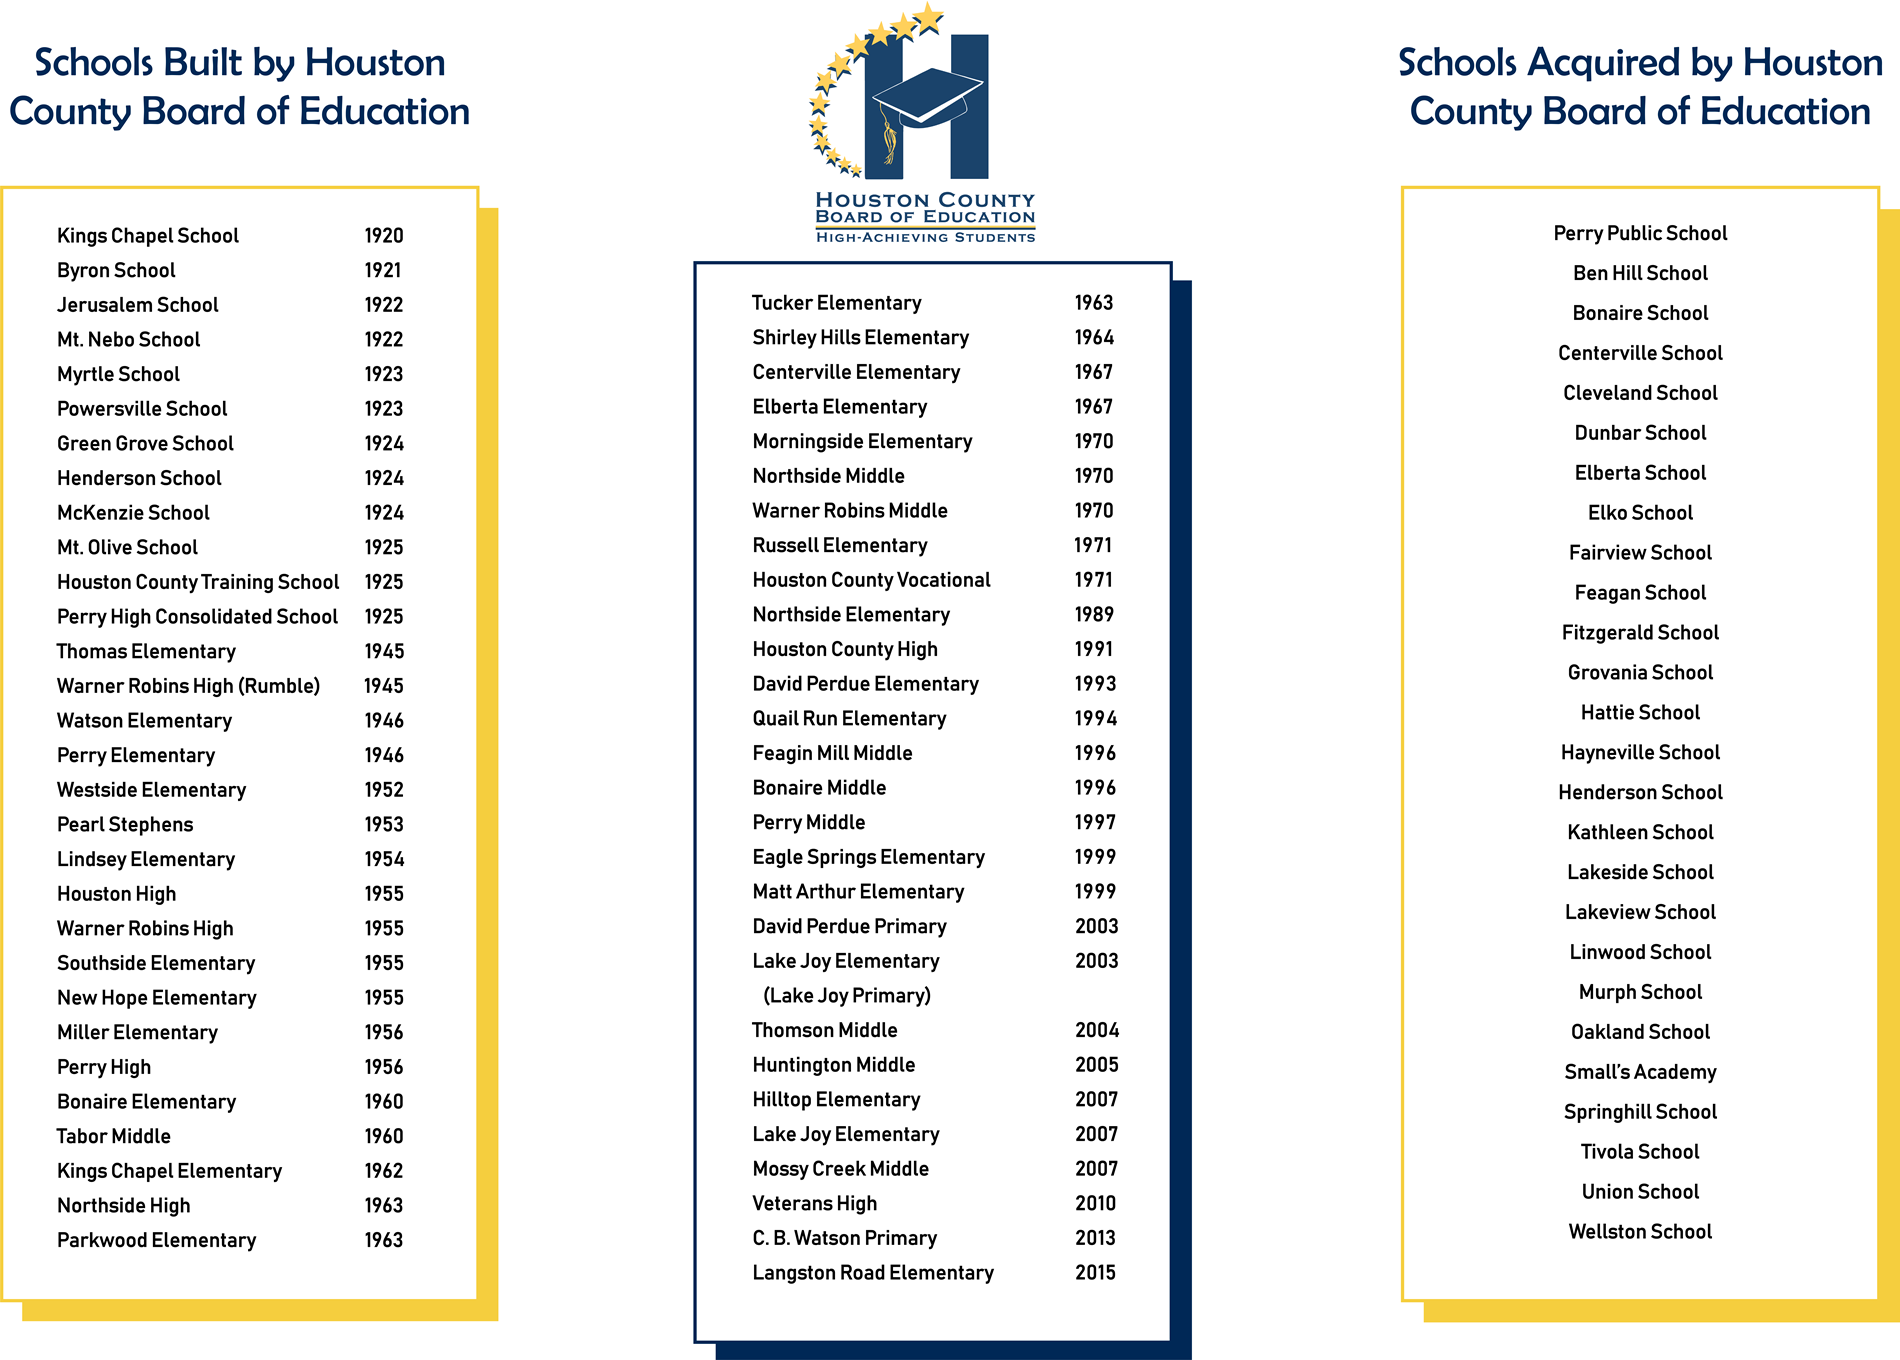 Board of Education List of Schools